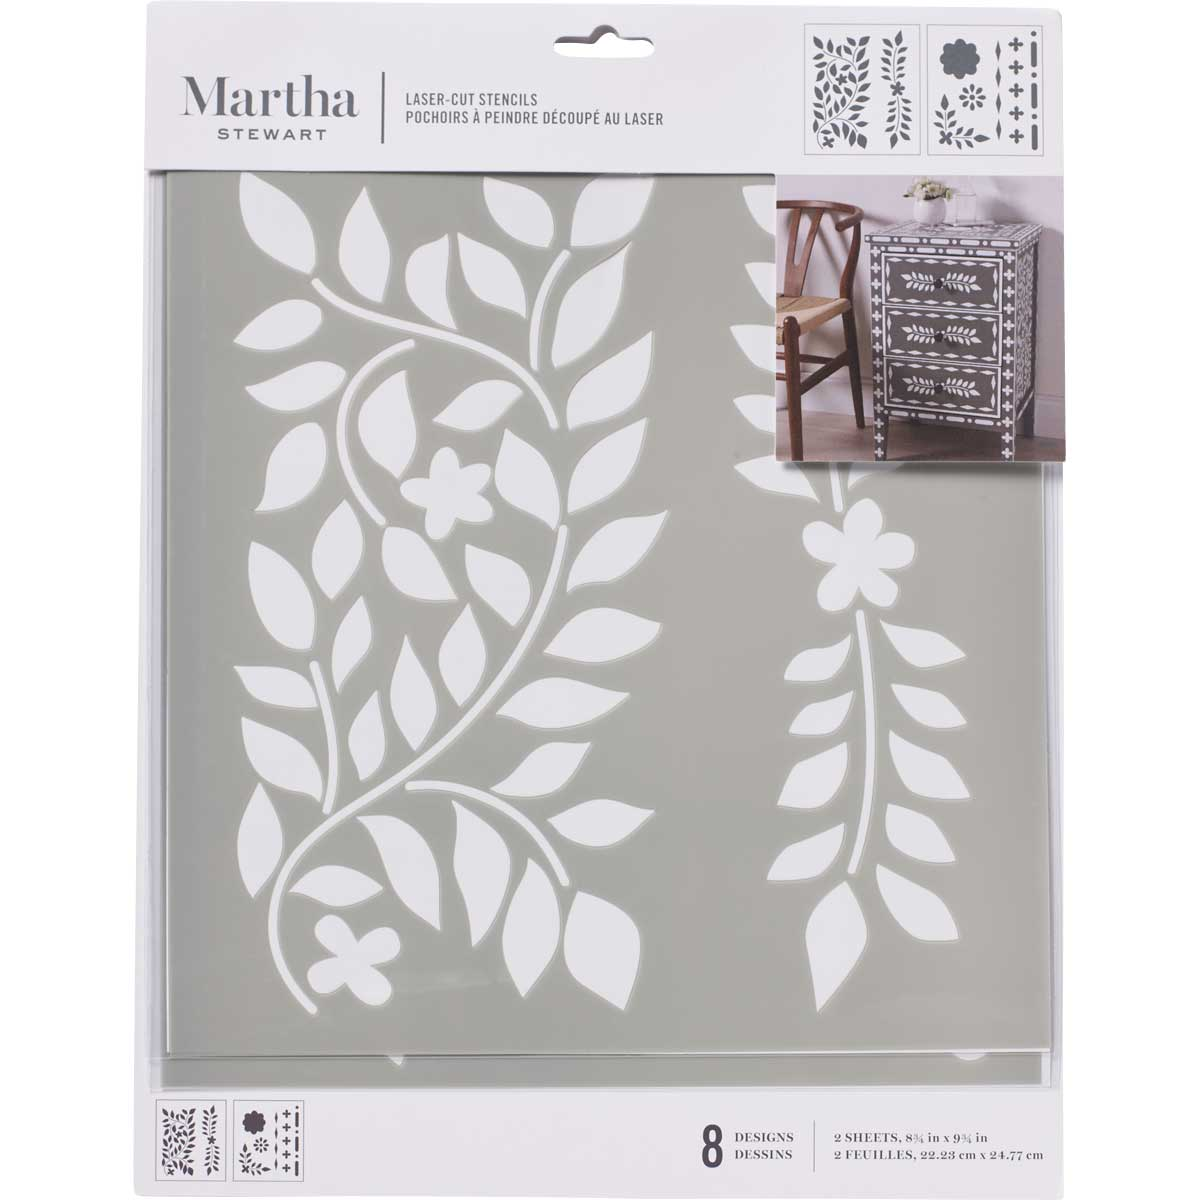 Martha Stewart ® Laser-Cut Stencil - Moroccan Inlay - 17652